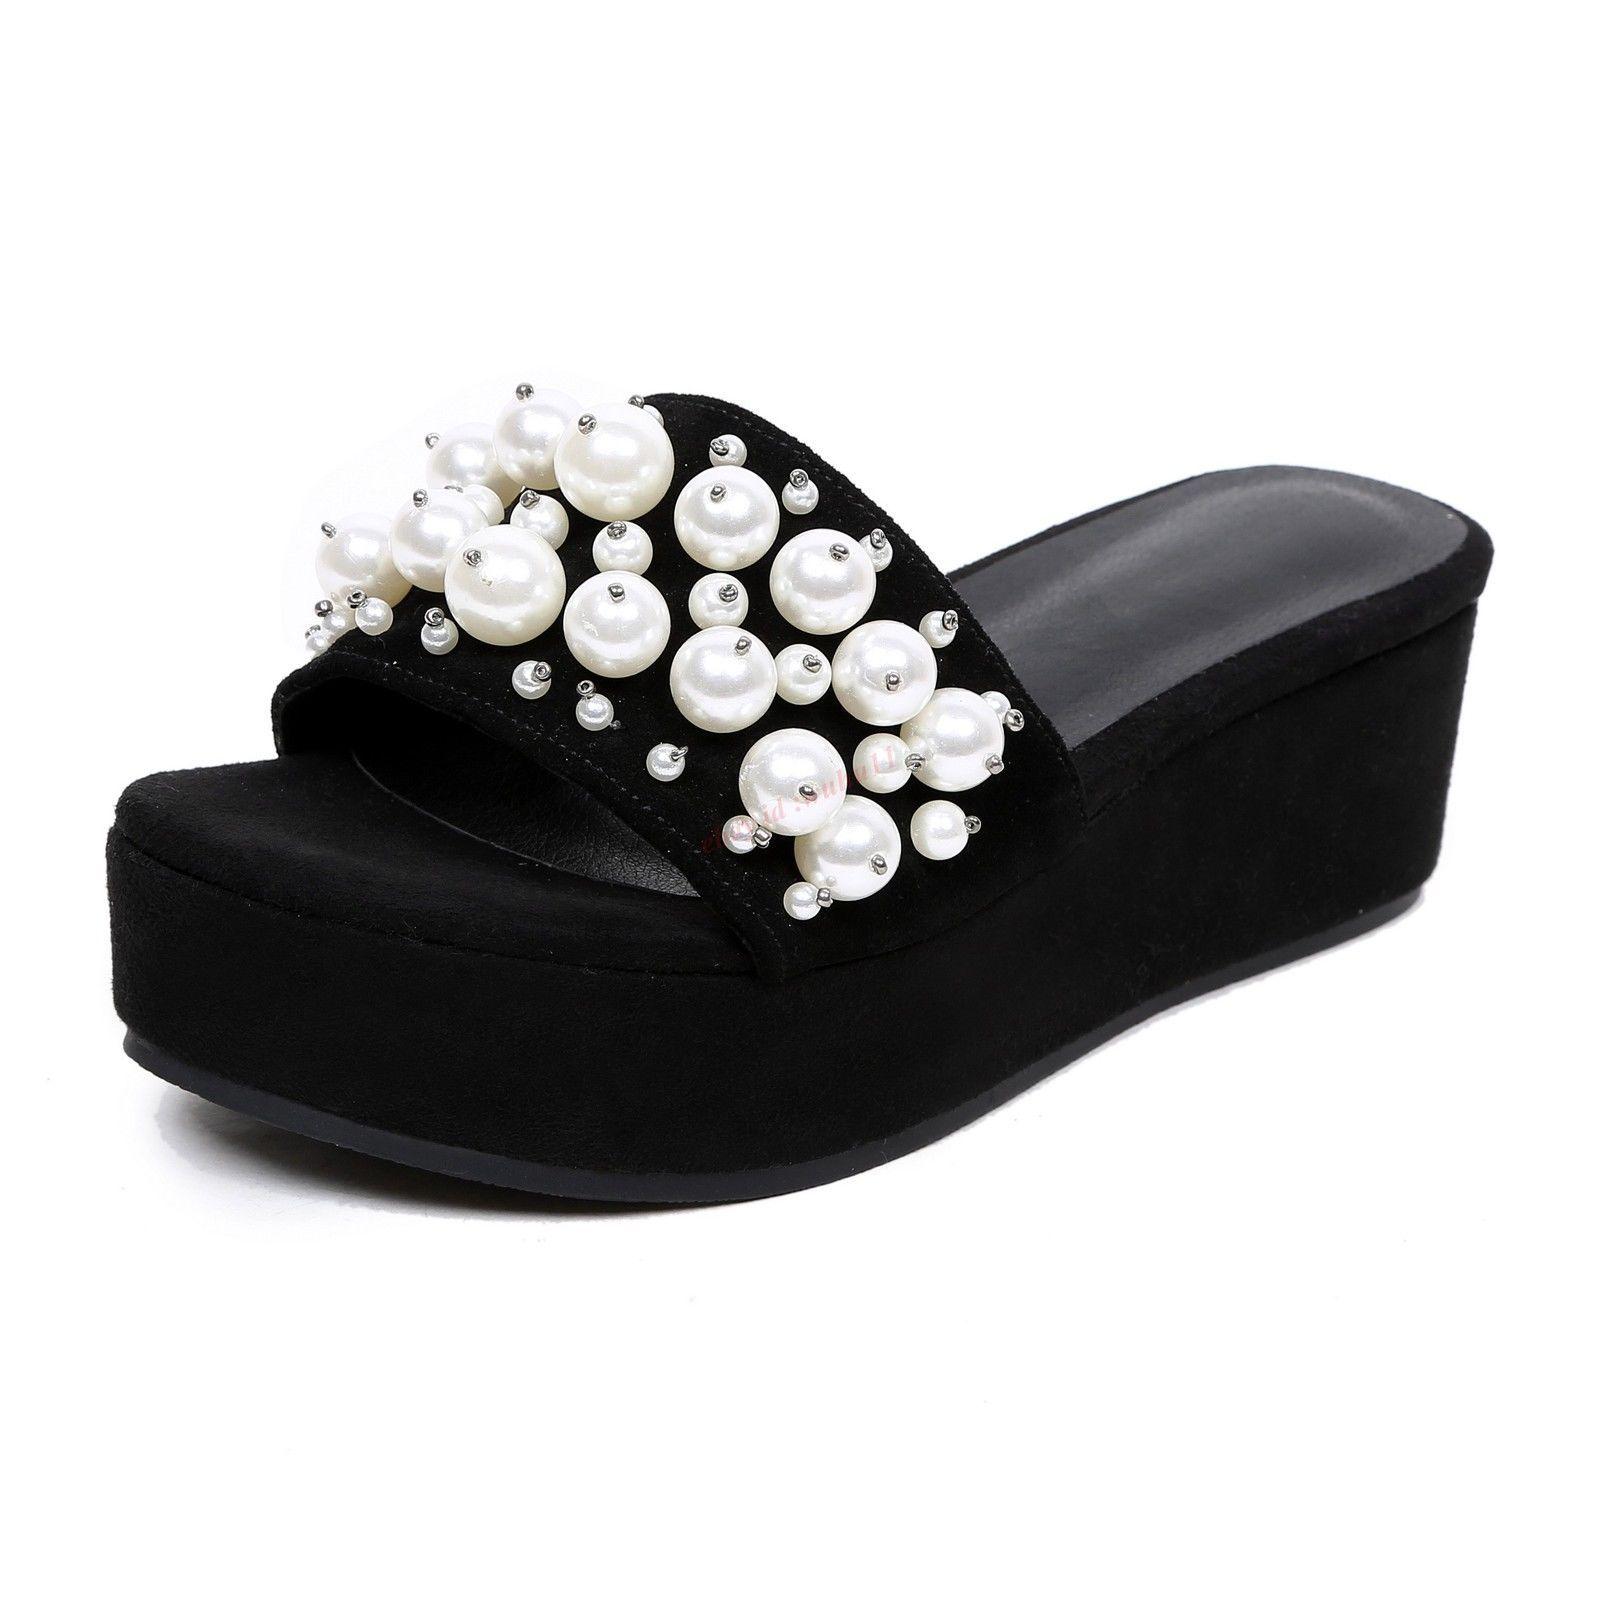 8f0063f5266c Womens Platform Glitter Beads Sandal Suede Open Toe Wedge Heel Black  Slippers